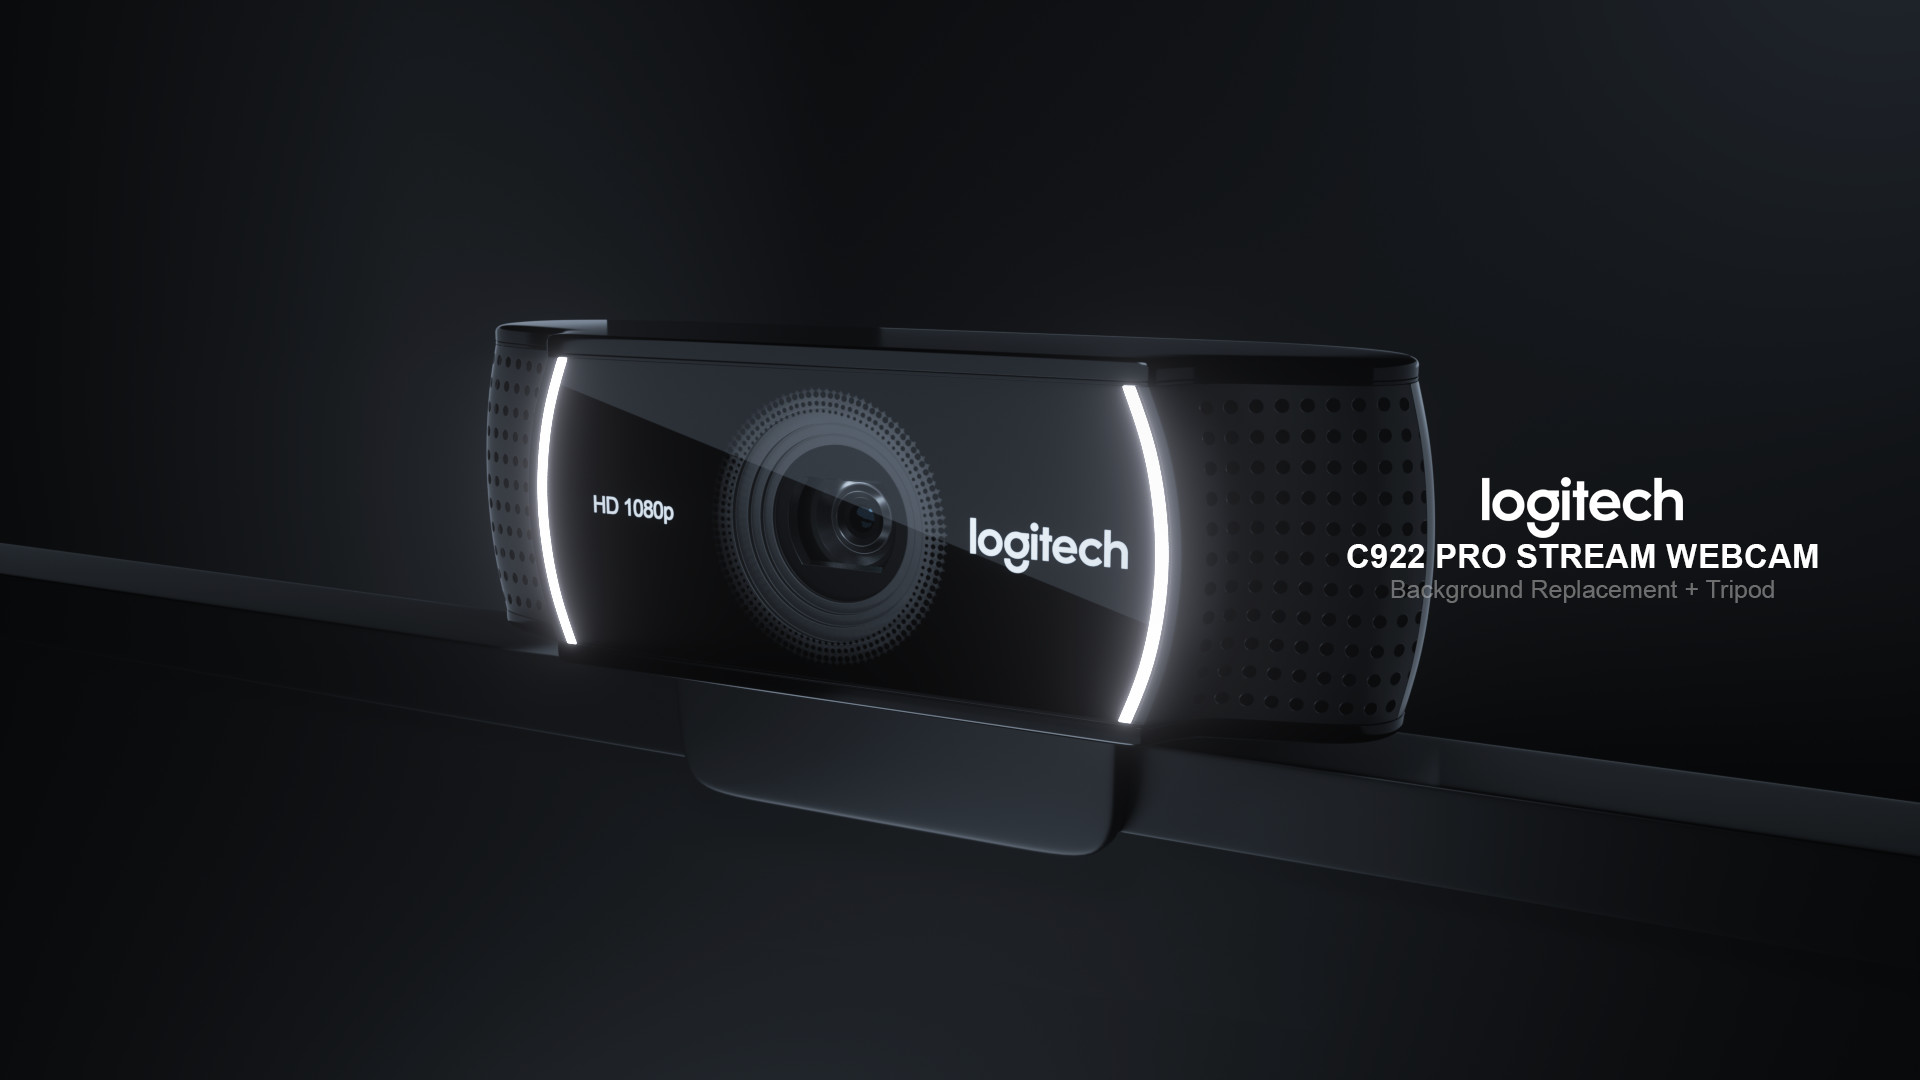 Marcus Ryden Logitech C922 Pro Stream Webcam